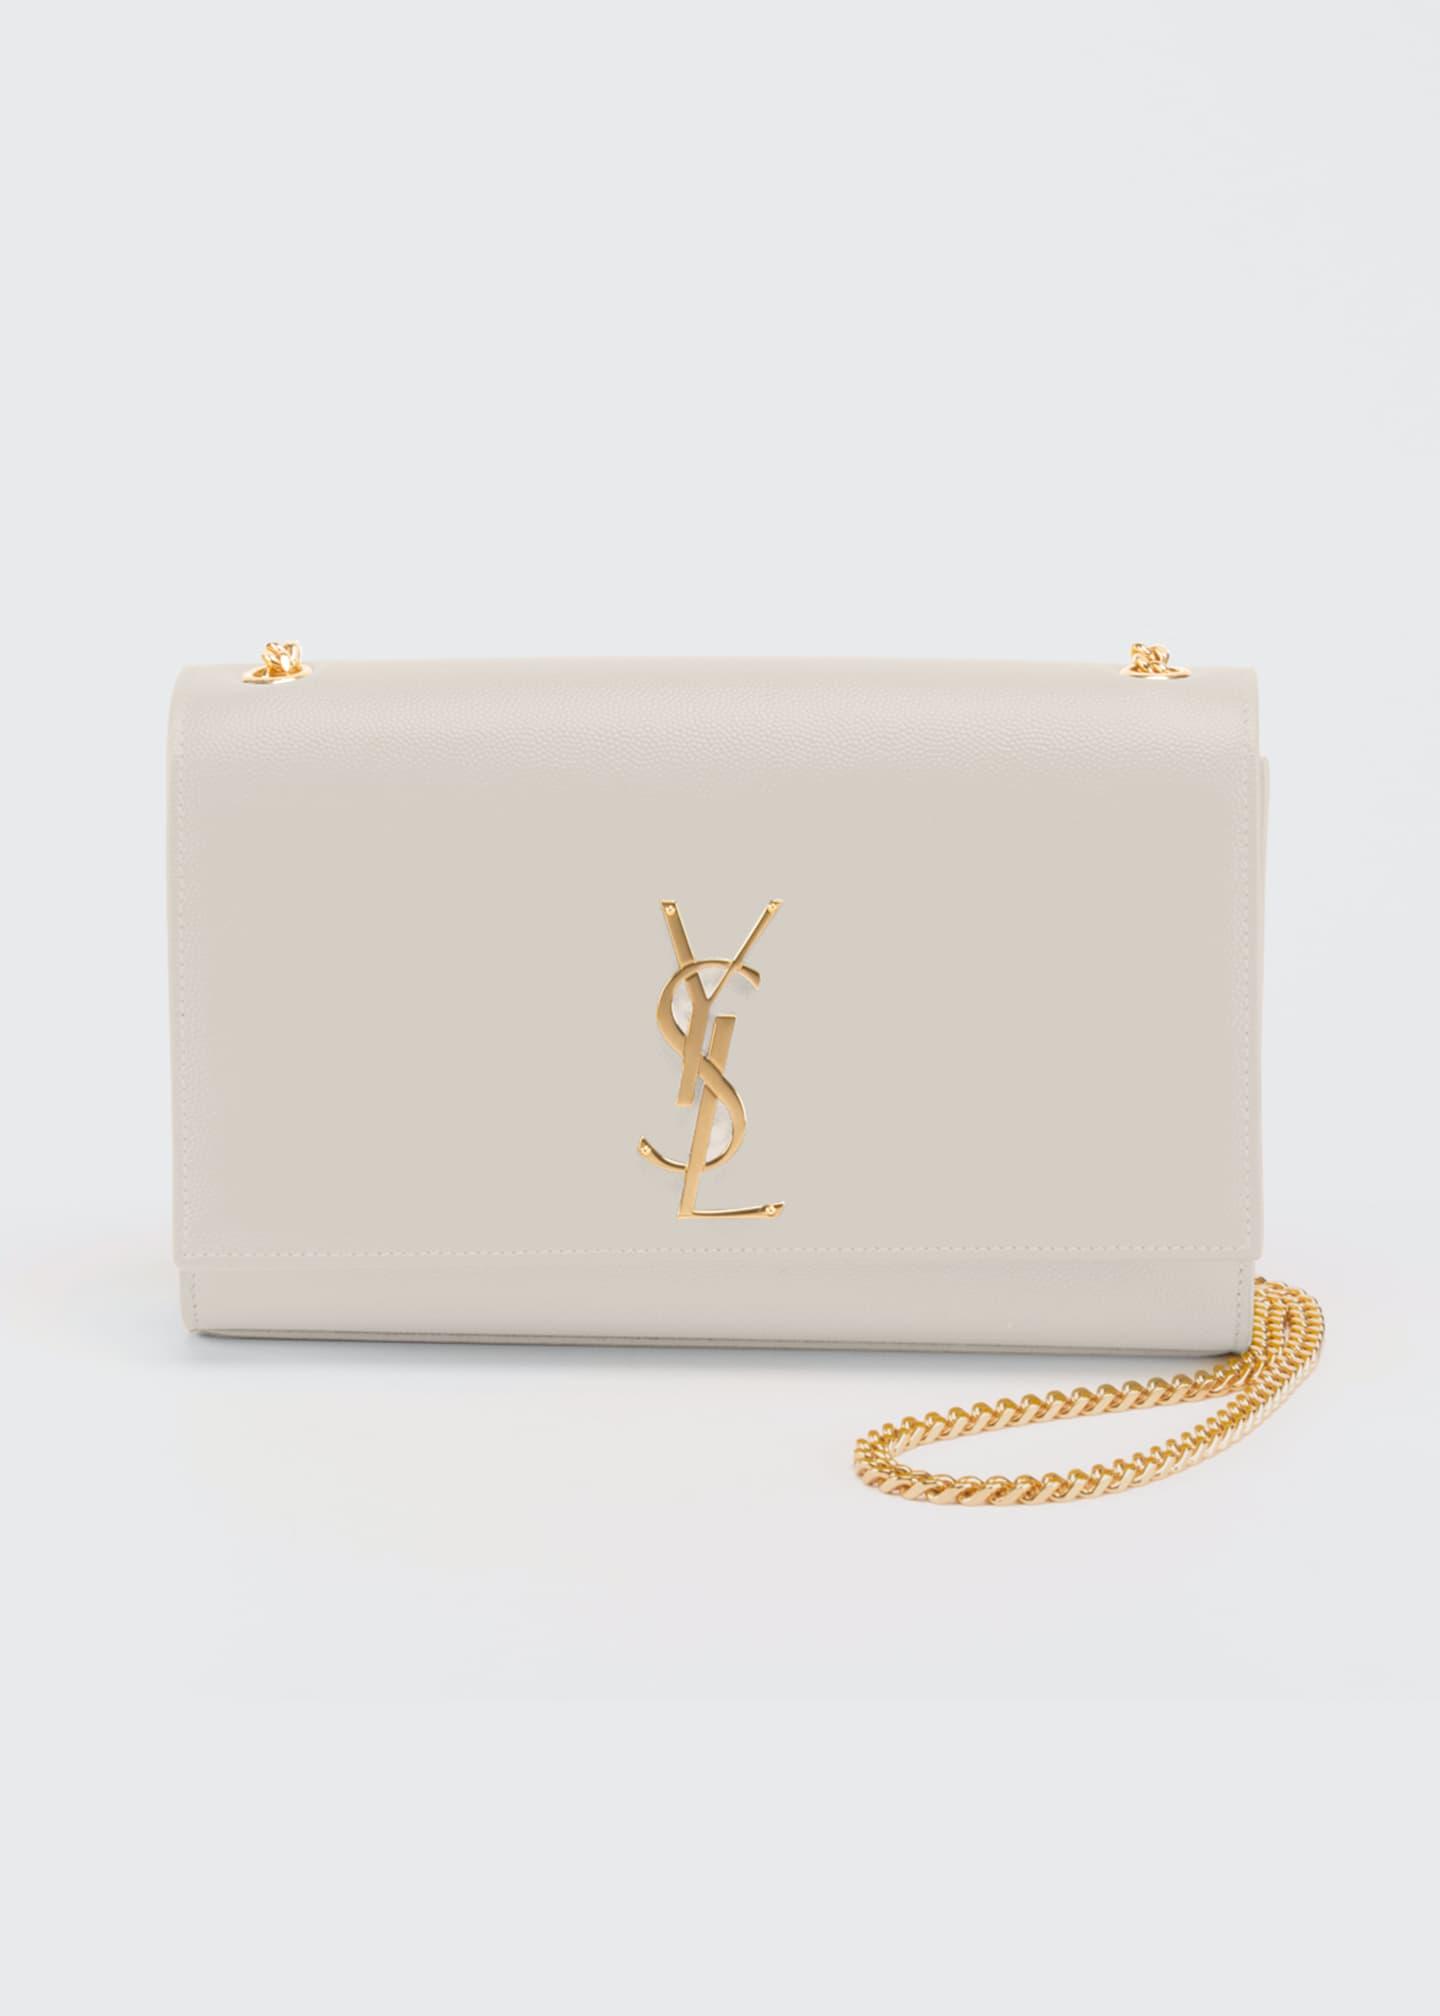 Saint Laurent Monogram YSL Medium Chain Shoulder Bag,